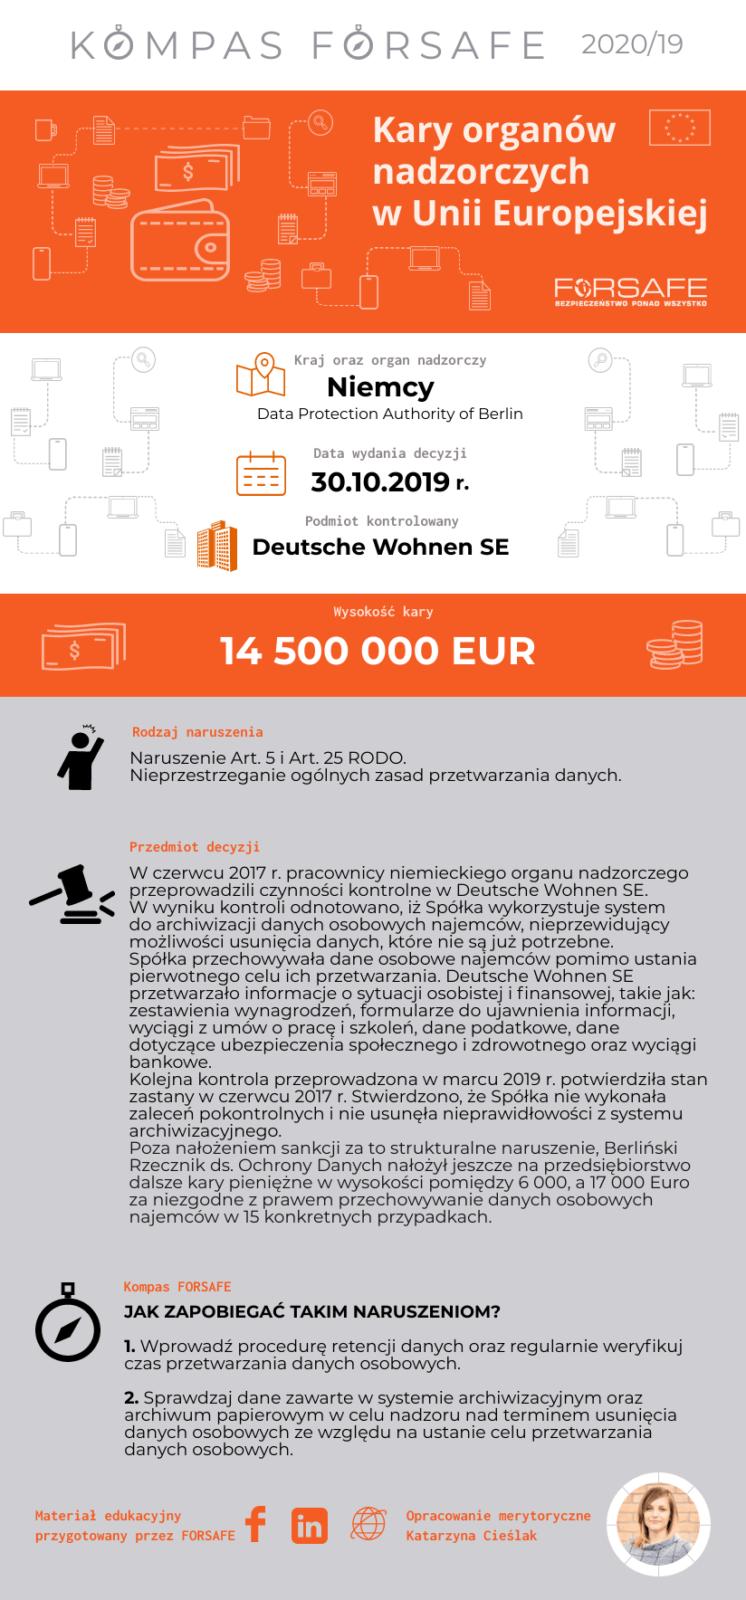 kompas forsafe eu 19 KOMPAS FORSAFE EU 2020/19 - Kara dla Deutsche Wohnen SE